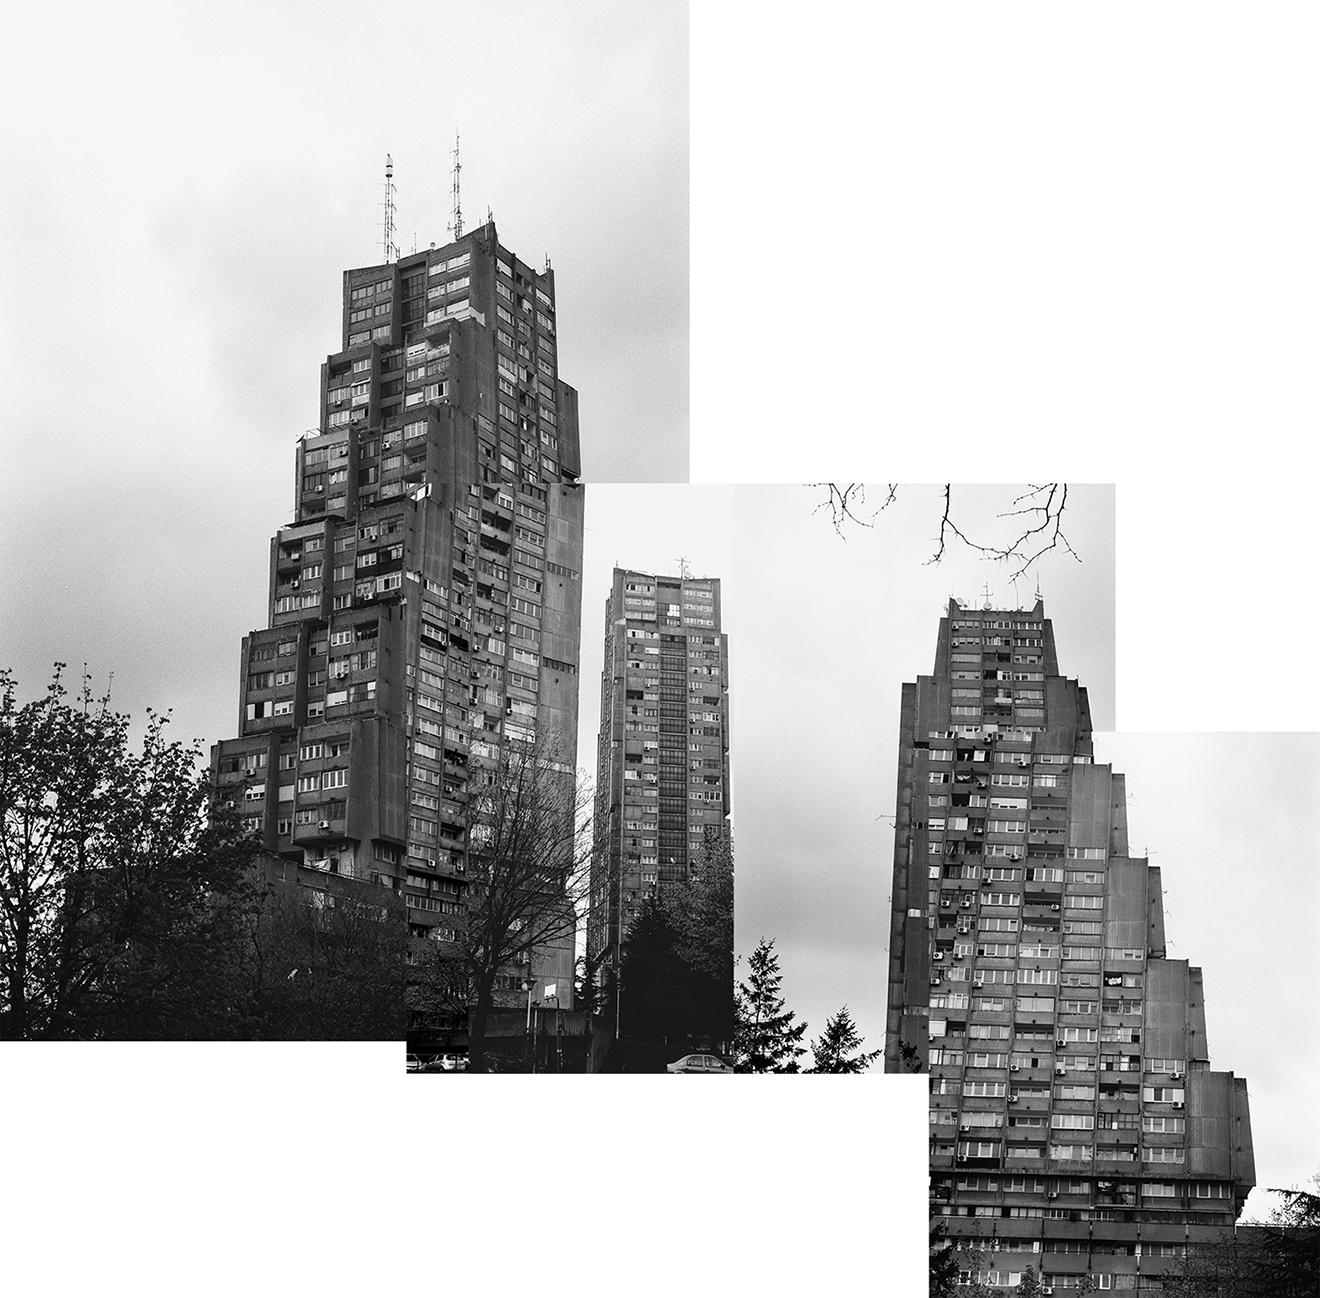 architektura Belgradu, Serbia, brutalizm, beton